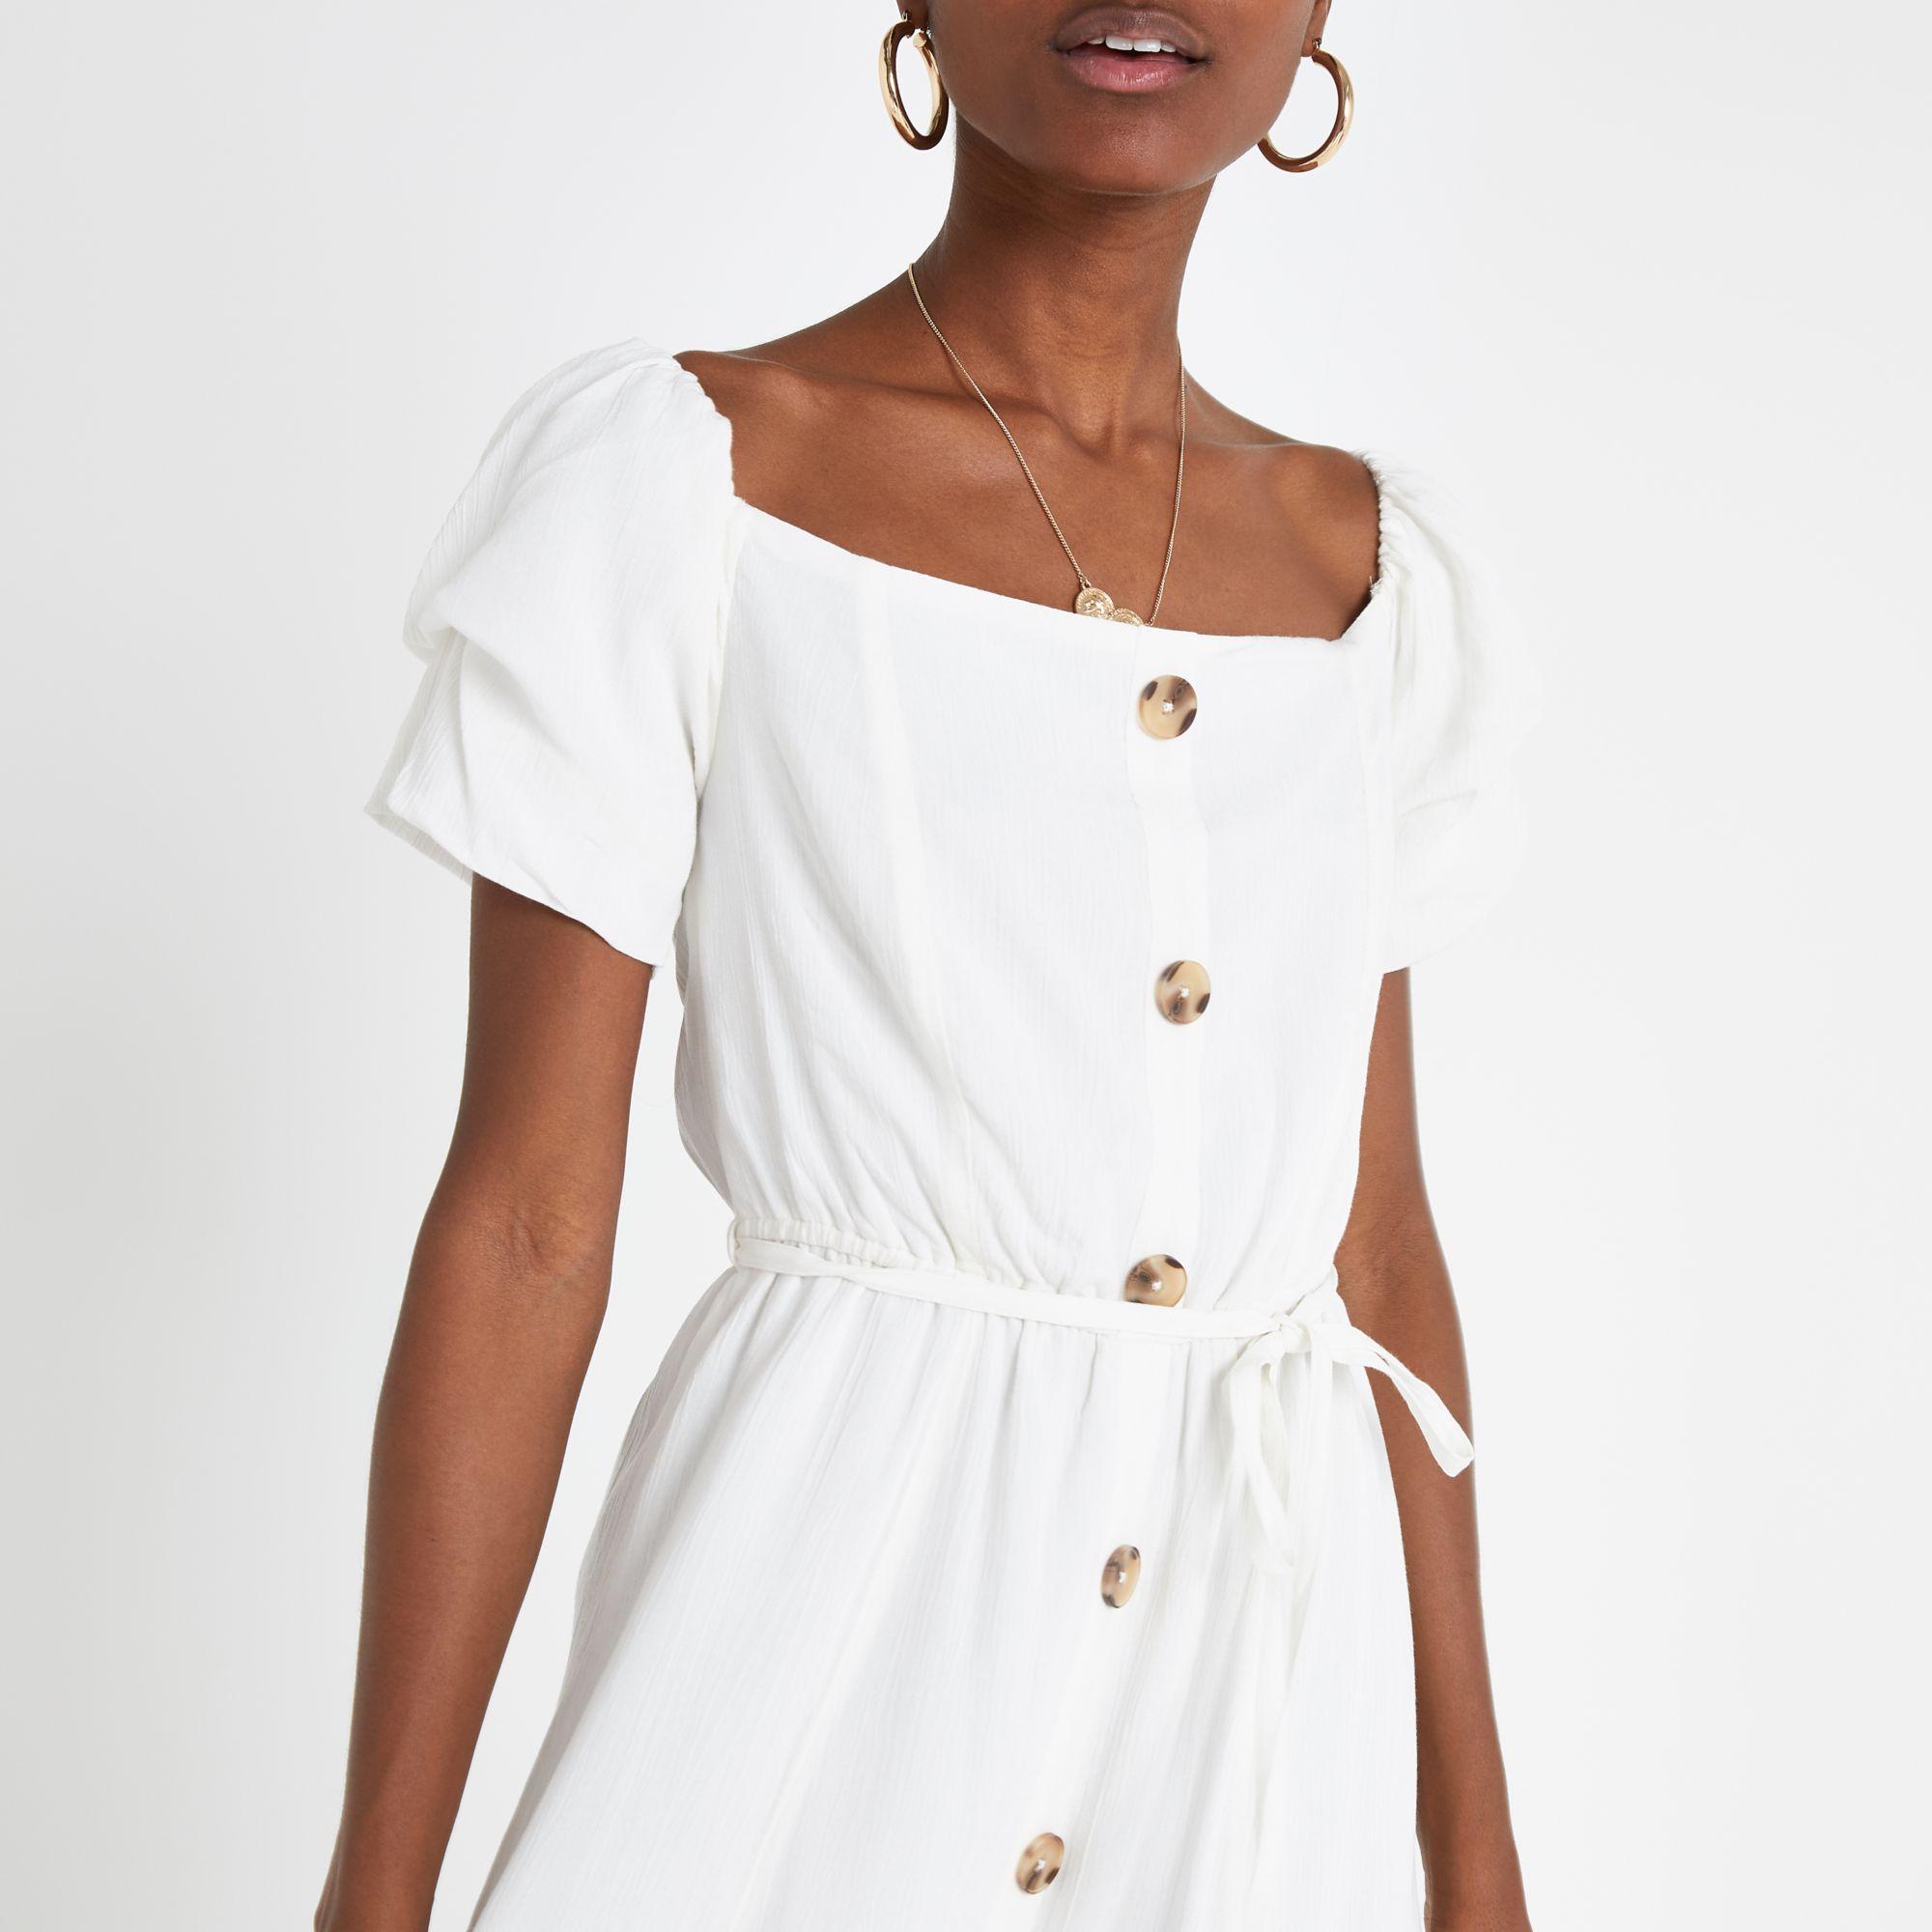 ff801f37f86 ... White Bardot Button Front Maxi Dress - Lyst. View fullscreen